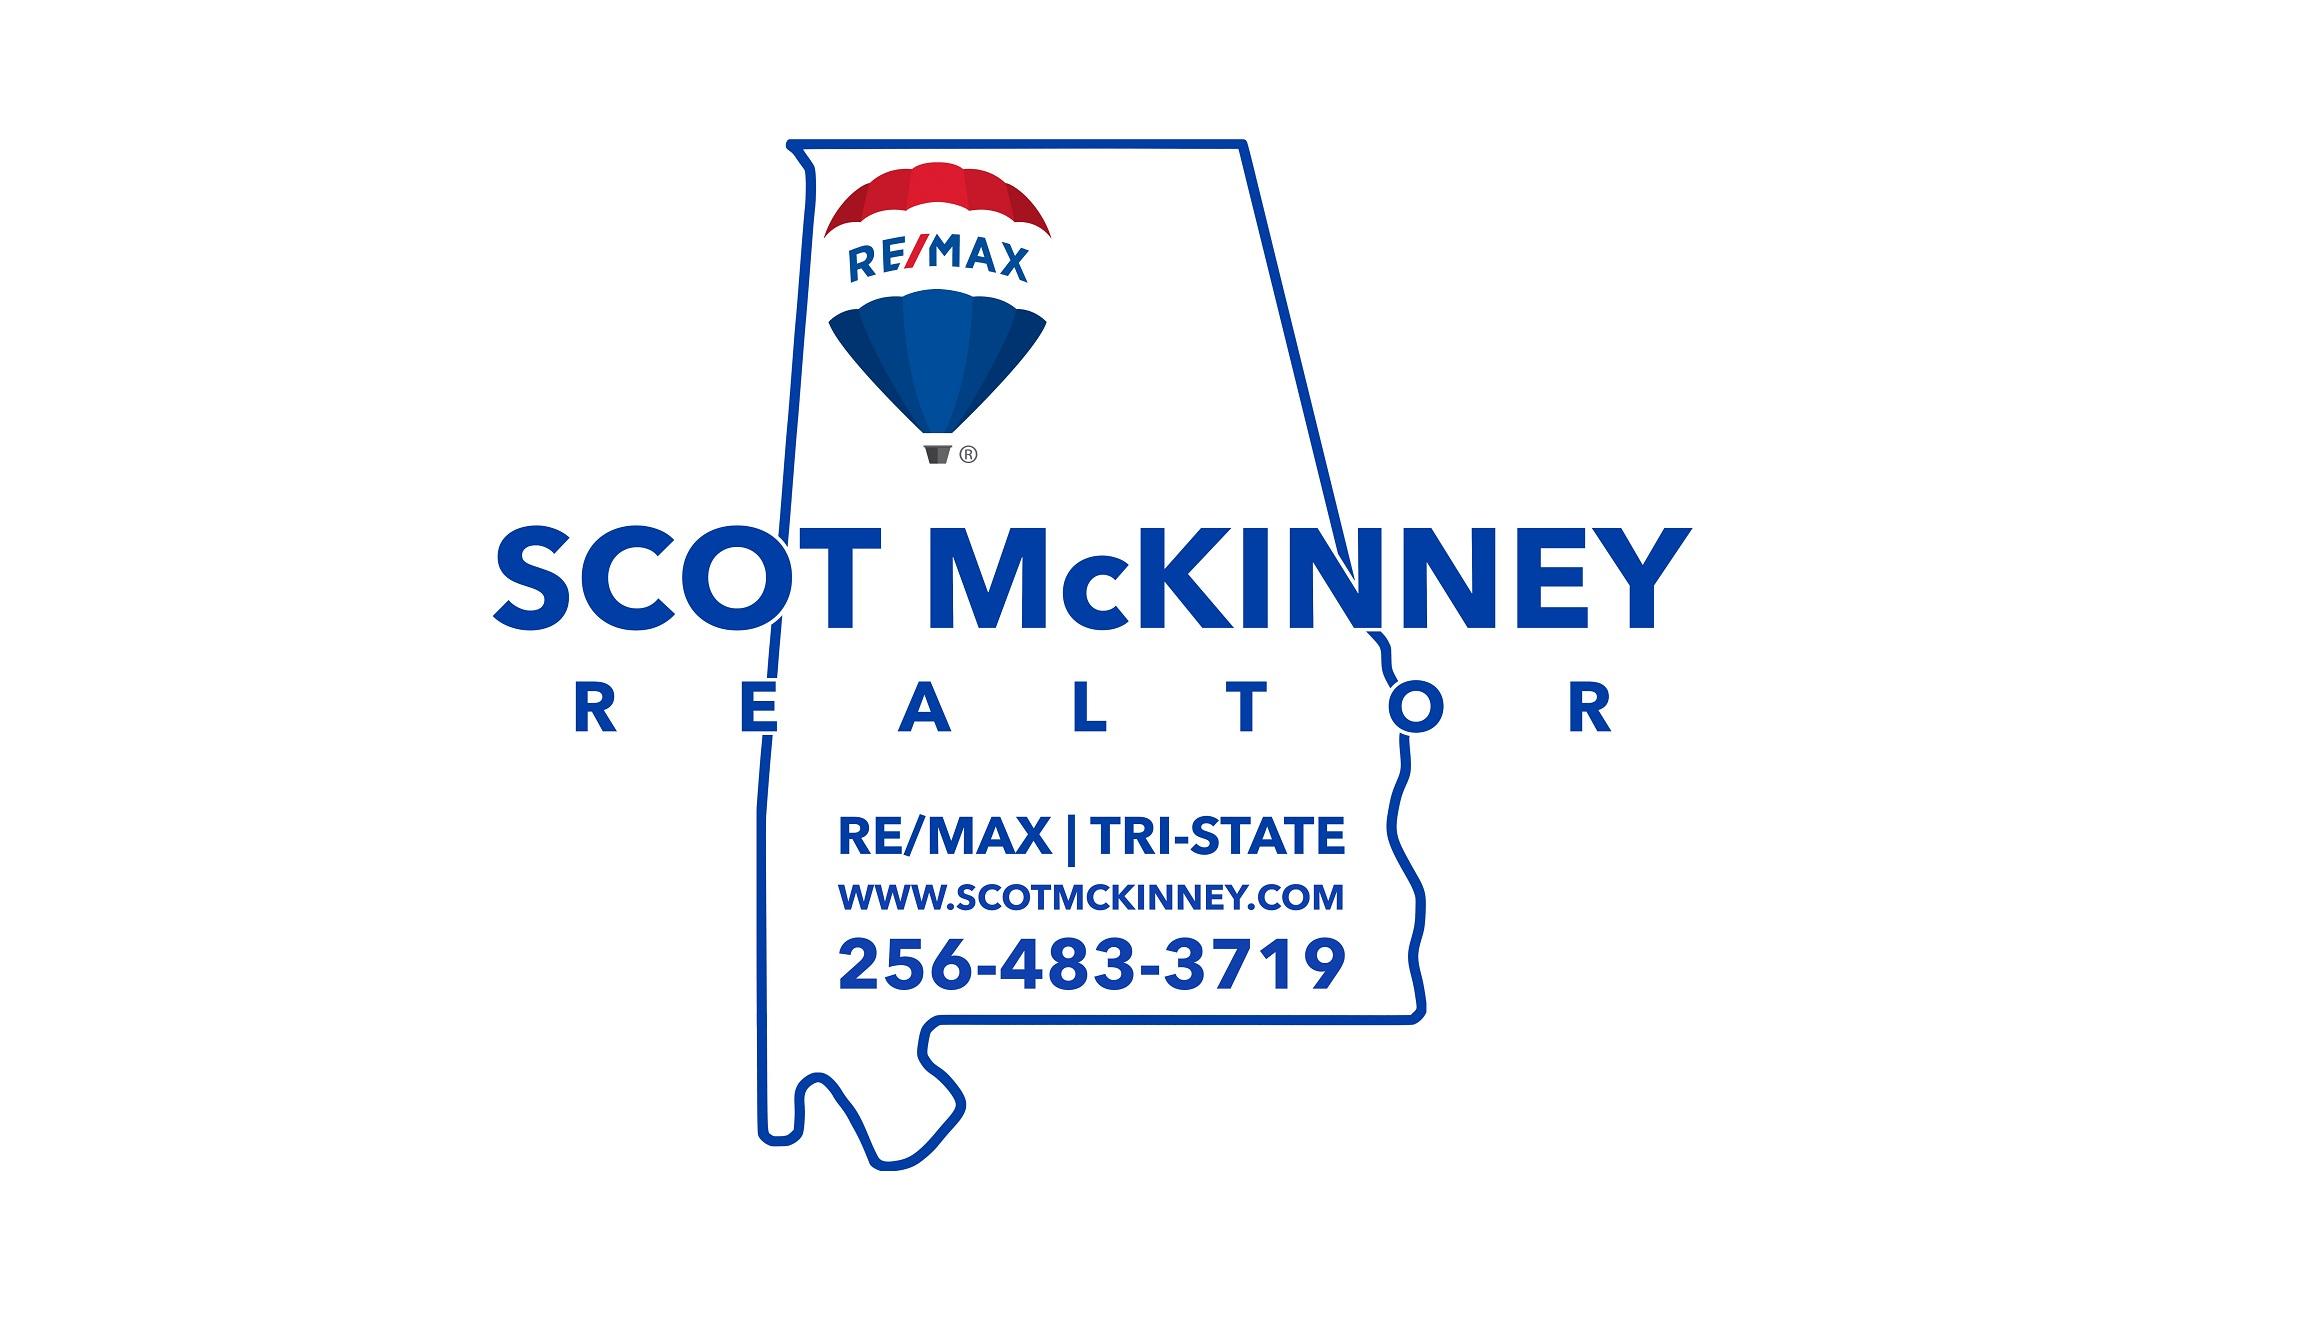 Scot McKinney